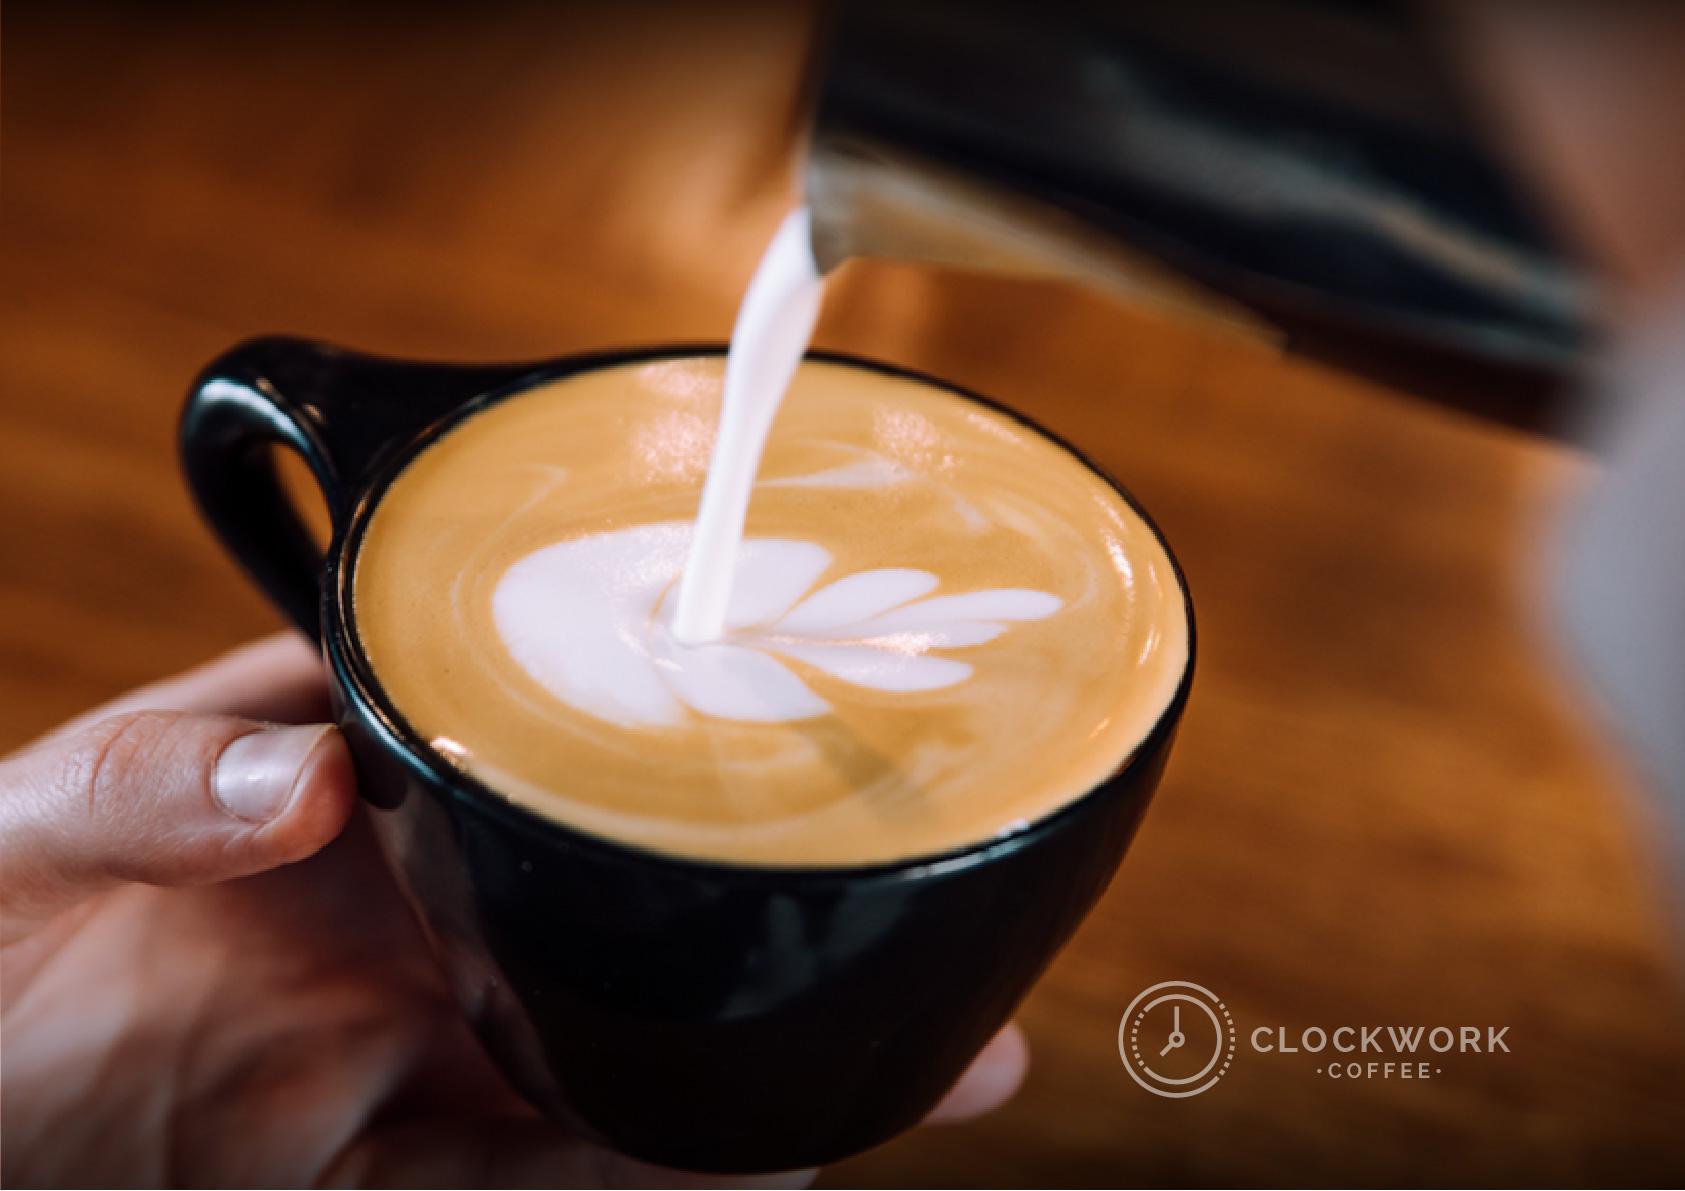 Clockwork Coffee  12.jpg